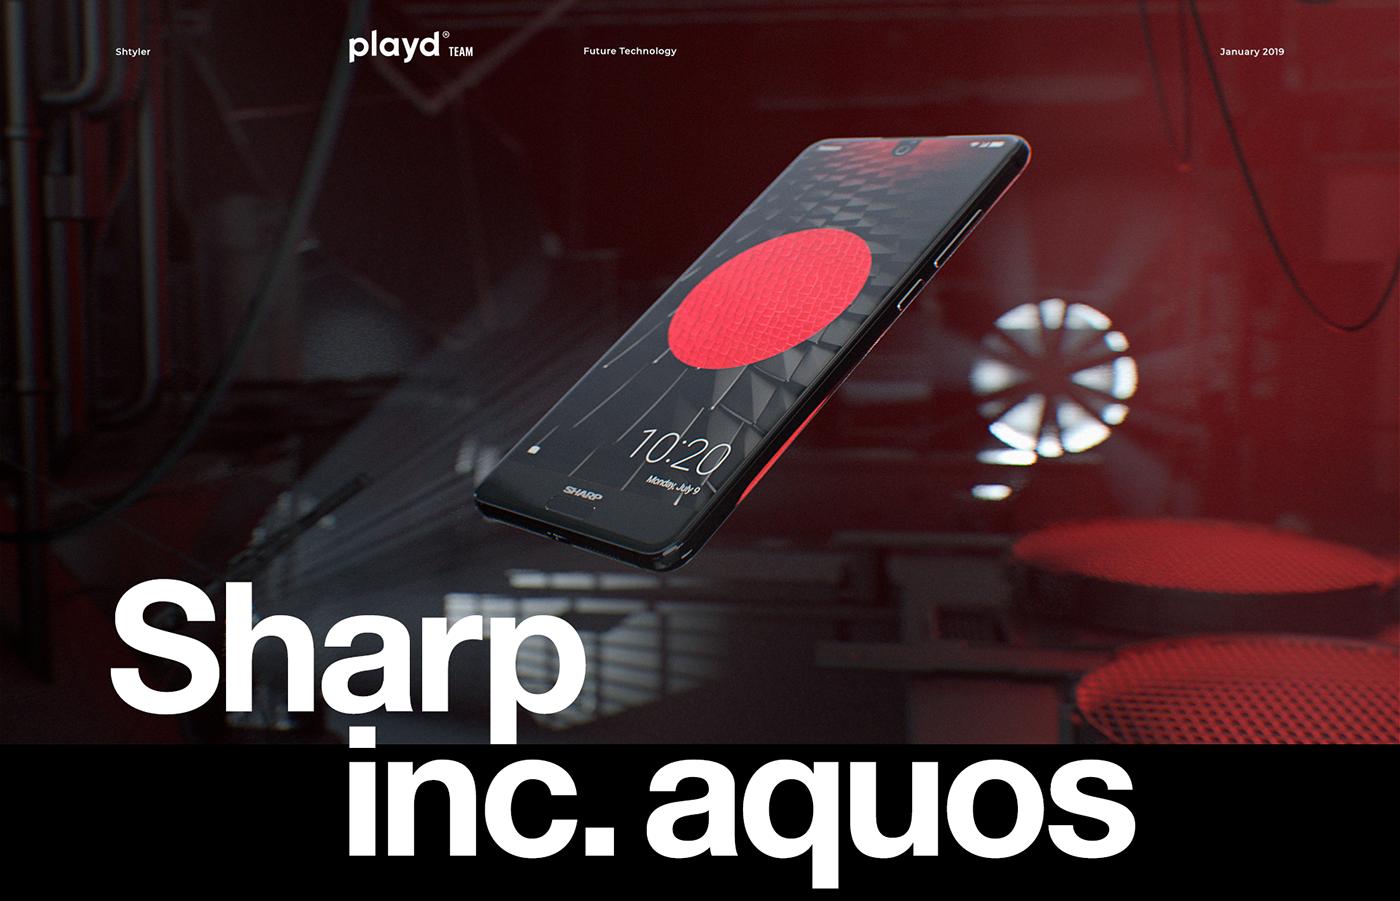 Sharp mobile japan smartphone galaxy Samsung iphone apple redshift Ae